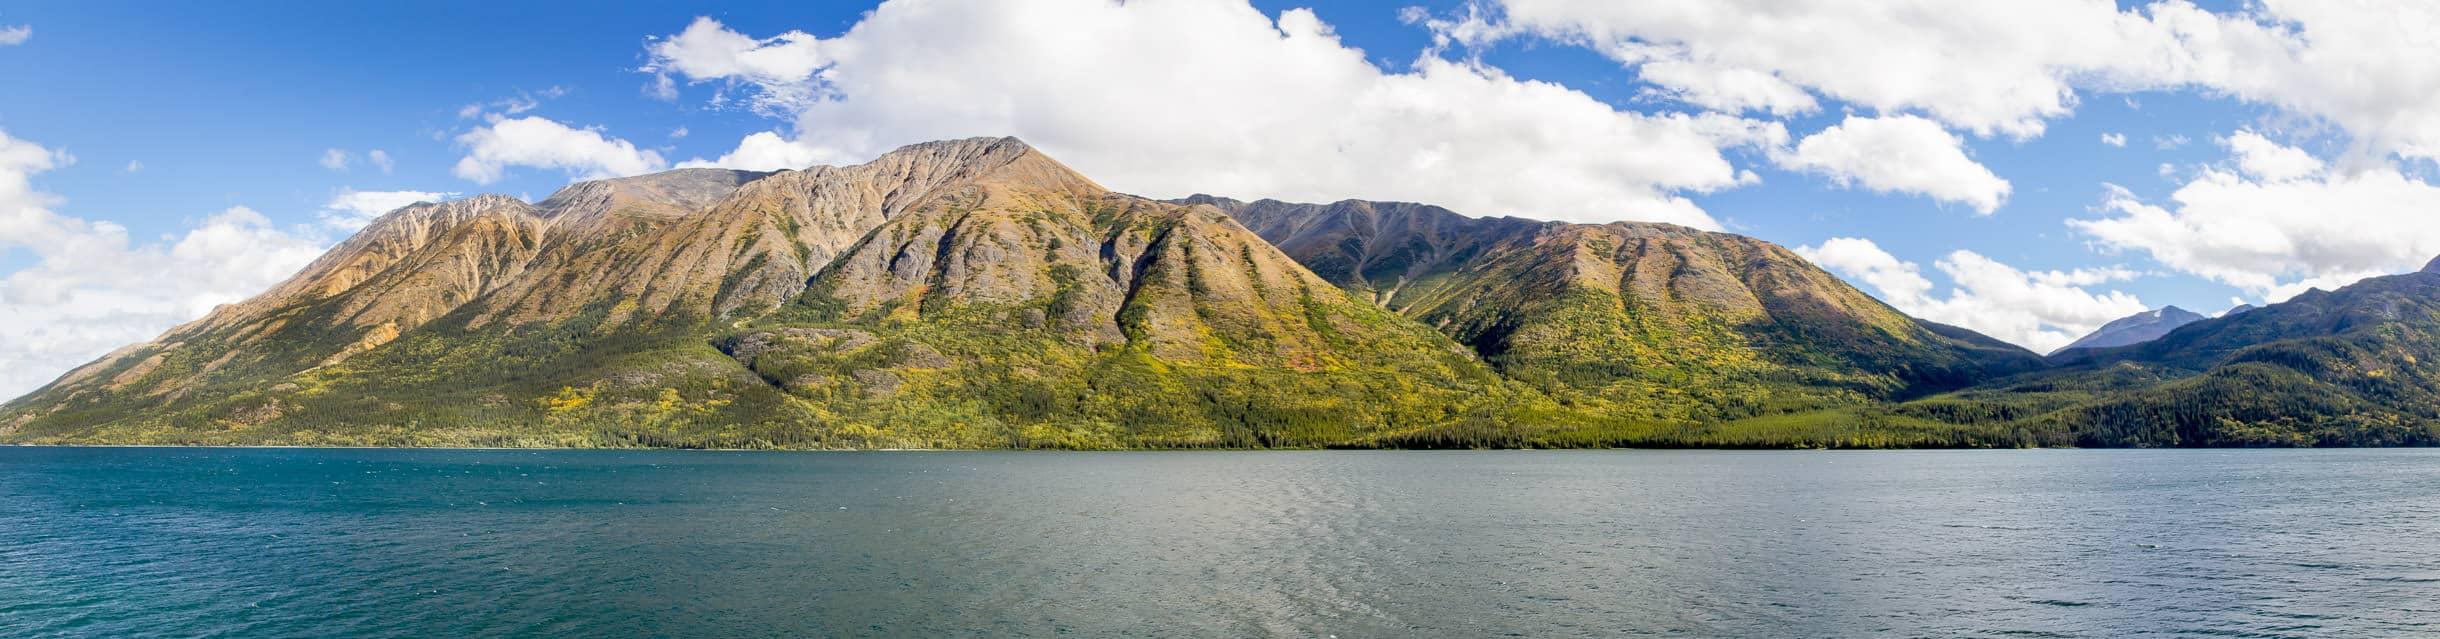 Mountains rise on the far shore of Tutshi Lake, British Columbia, Canada.